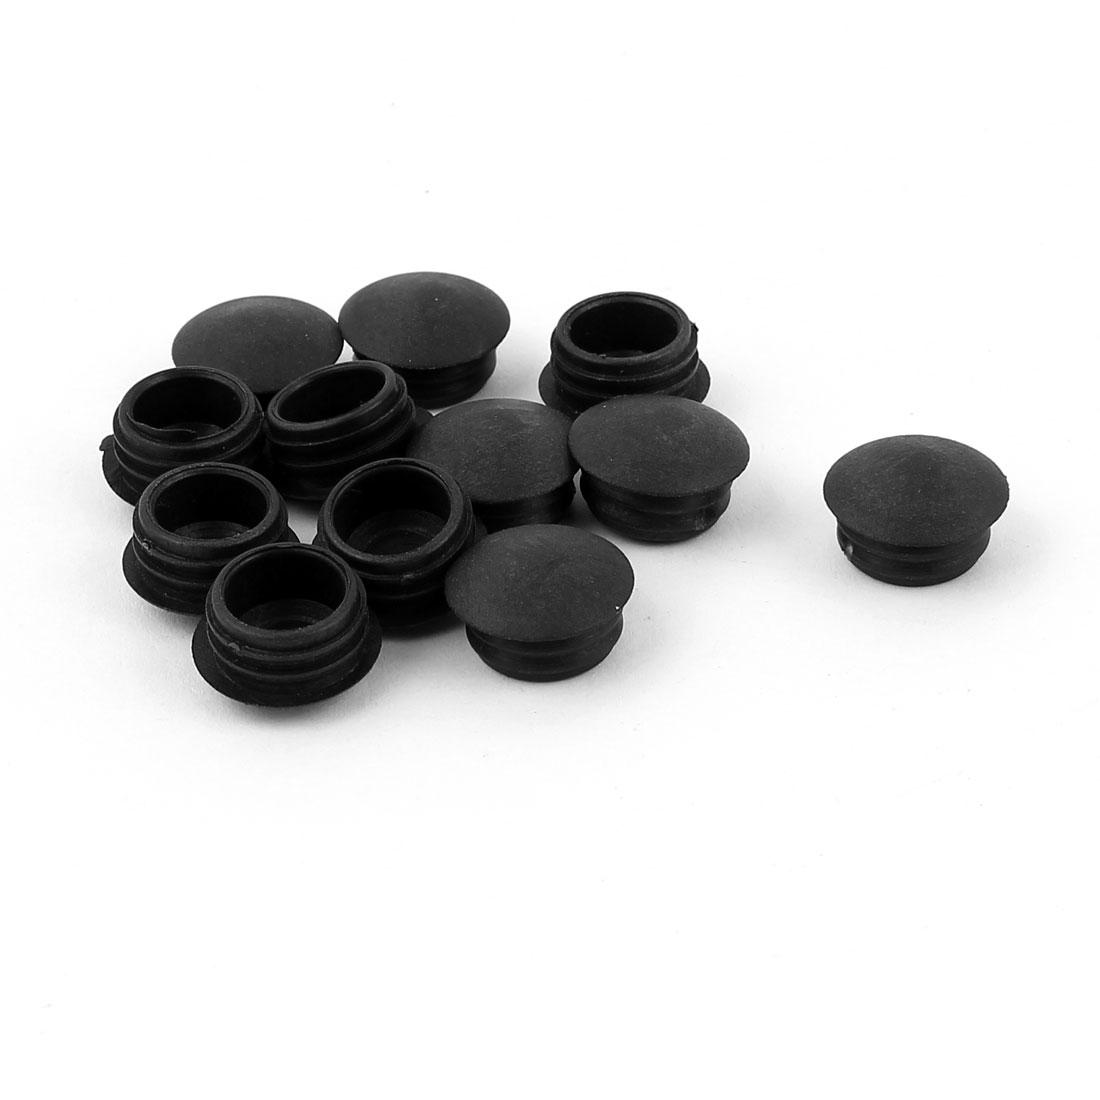 Blanking End Caps 13mm Dia Plastic Round Tubing Tube Inserts 12 Pcs